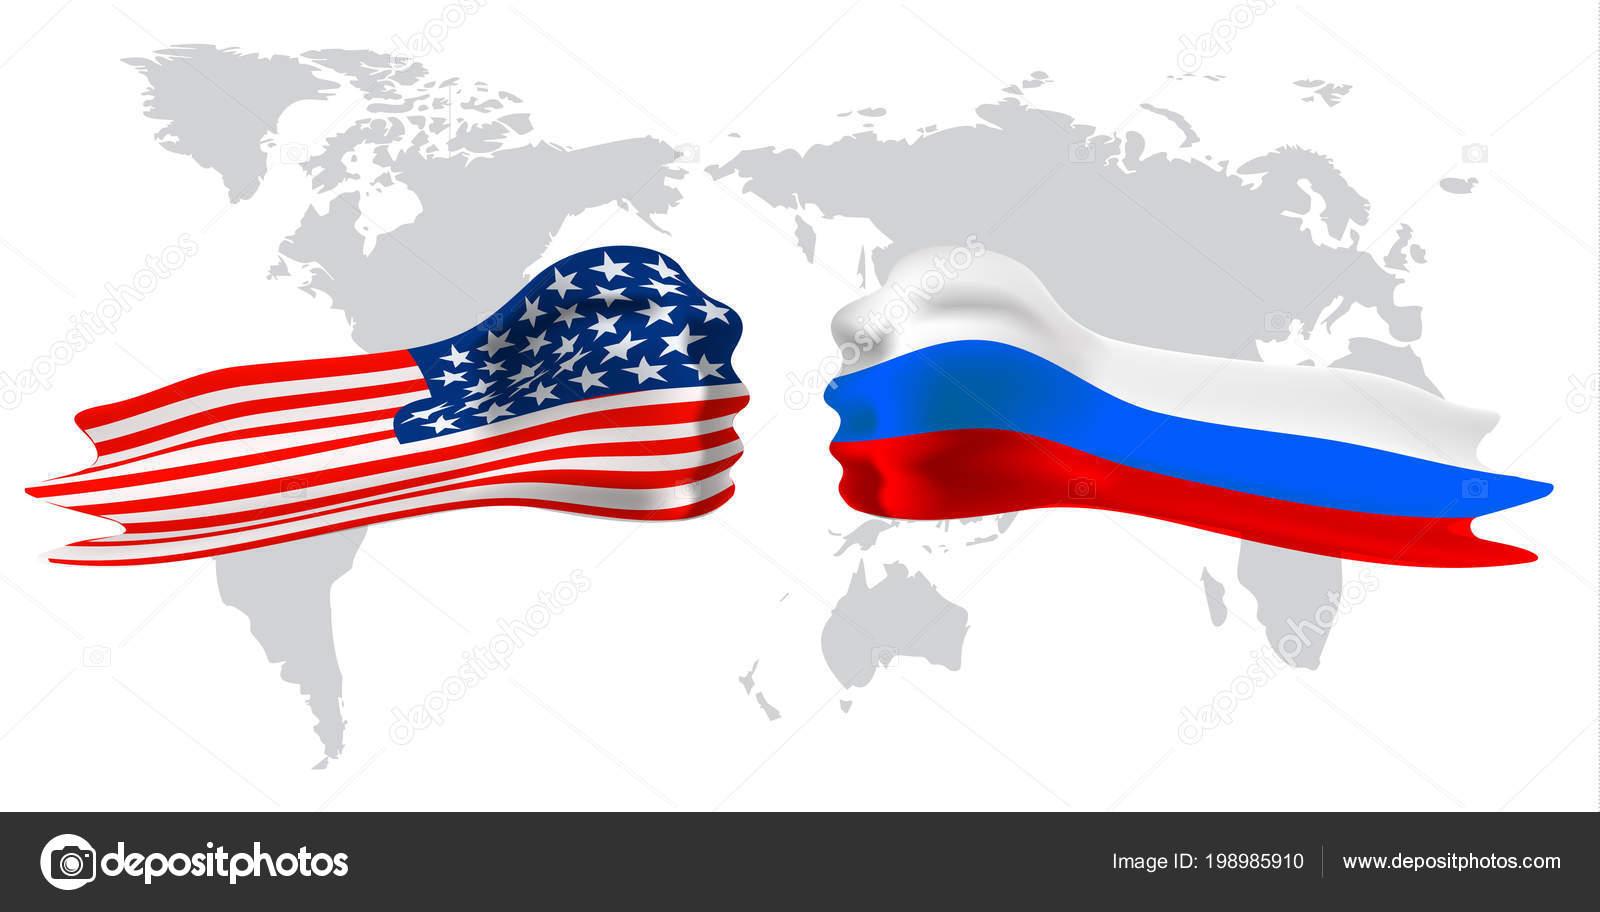 Russia vs america fist flag on world map background stock vector russia vs america fist flag on world map background stock vector gumiabroncs Images